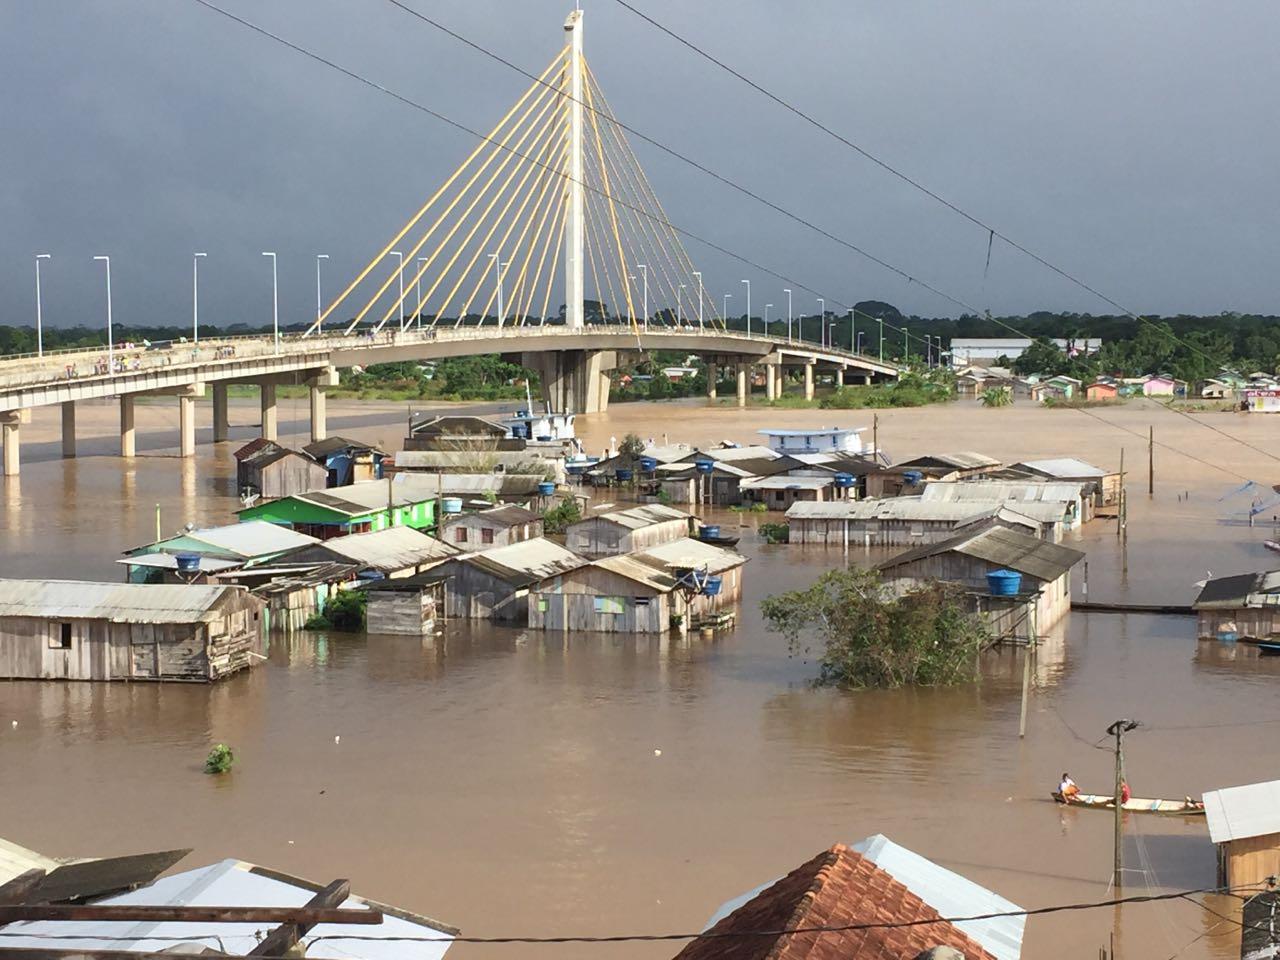 Floods inundated many homes in Cruzeiro do Sul.